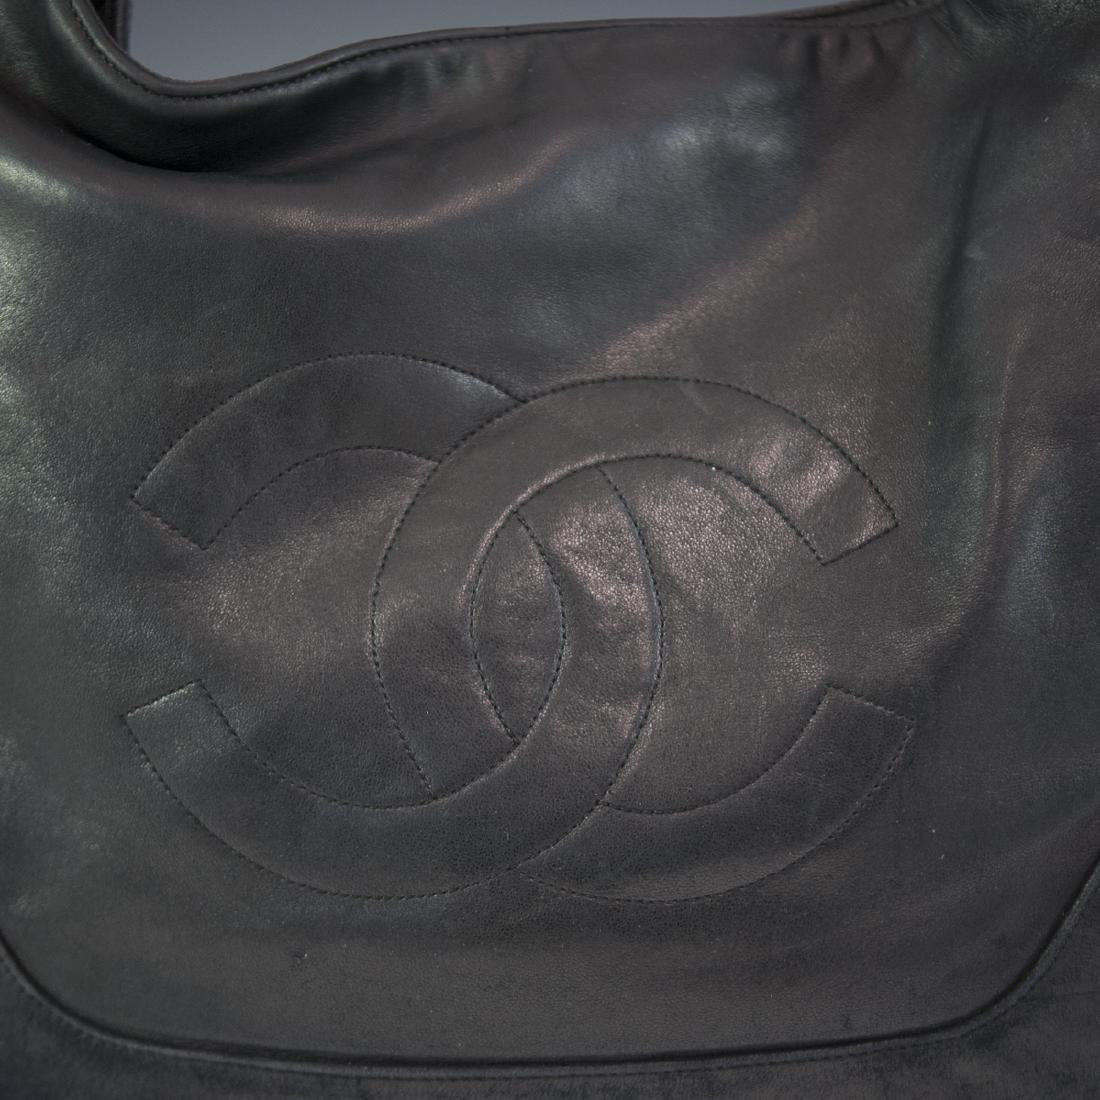 Chanel Black Leather Purse - 2